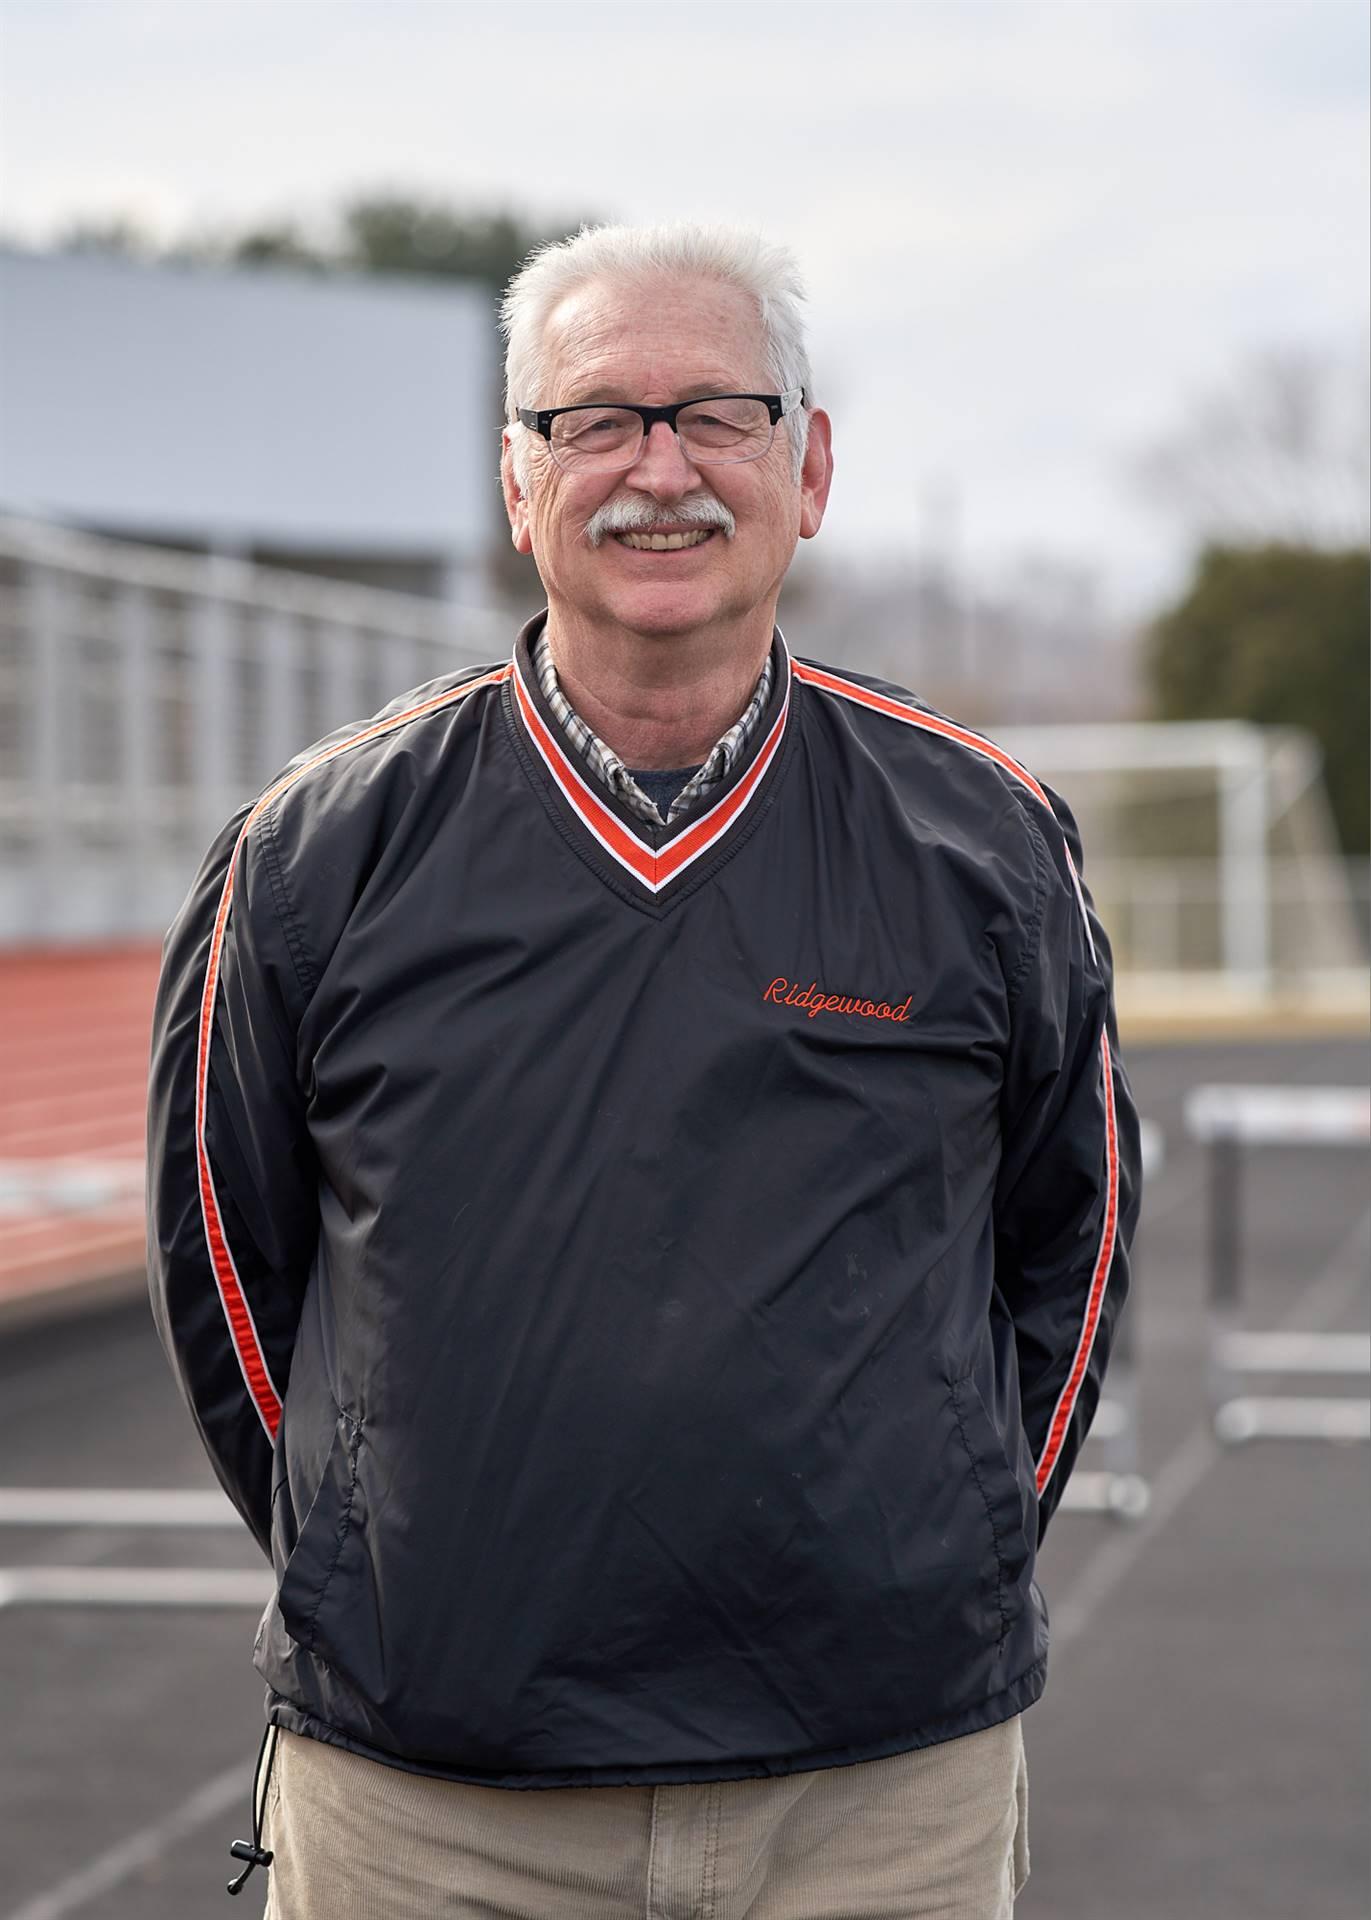 2019 girl track coach